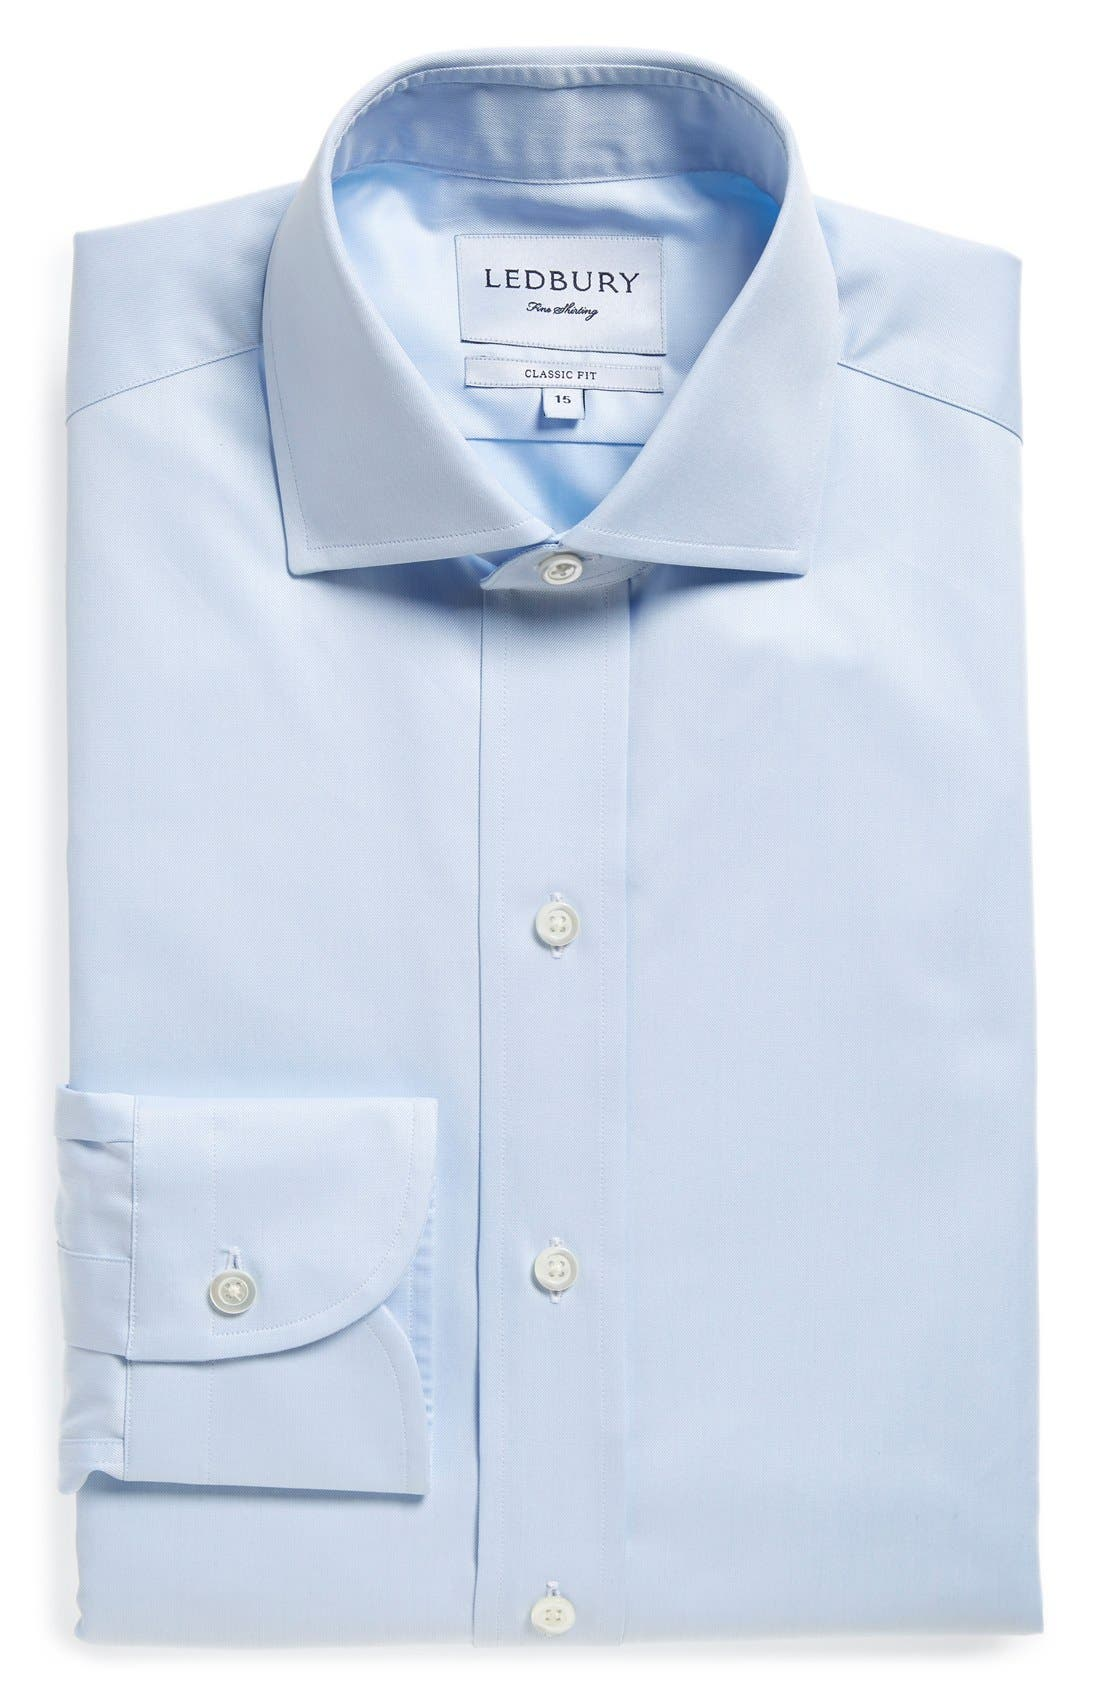 Ledbury 'Fine Twill' Classic Fit Dress Shirt